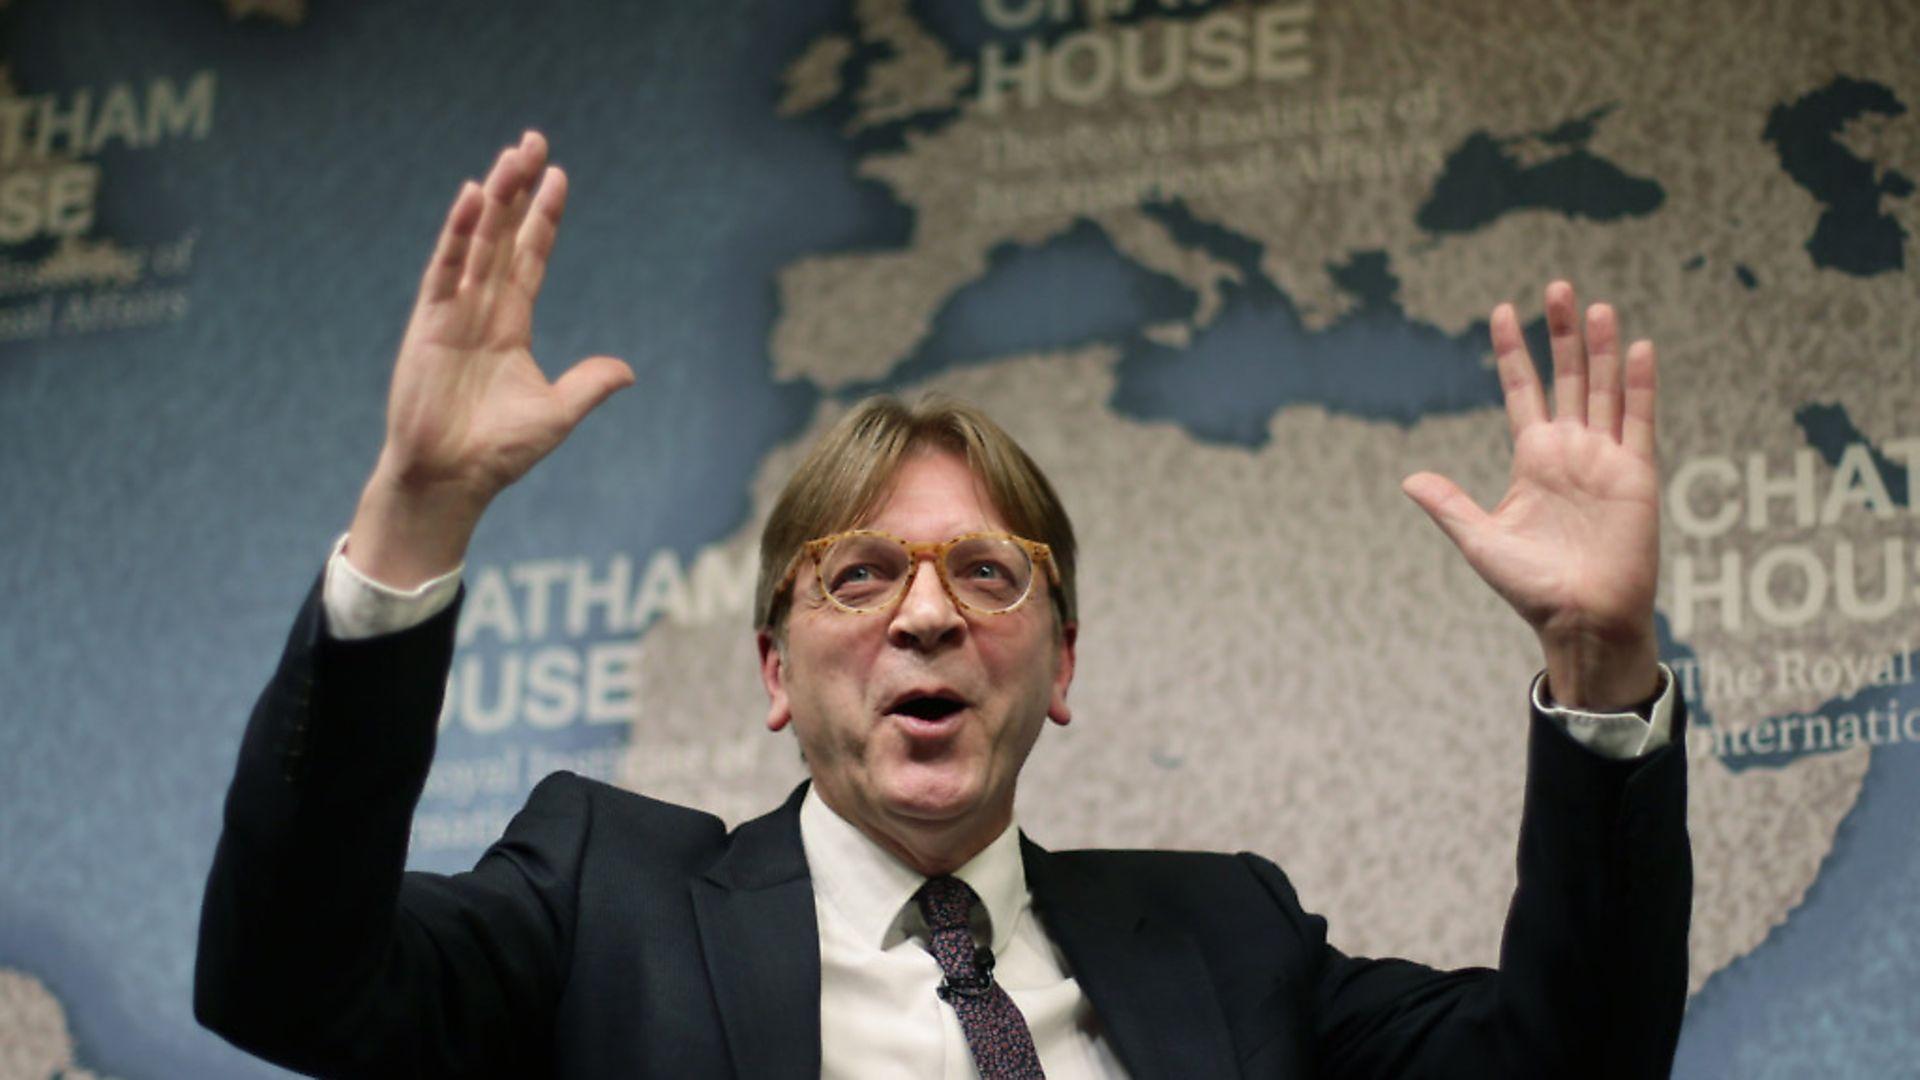 European Parliament Brexit negotiator Guy Verhofstadt. Photograph: Yui Mok/PA. - Credit: PA Archive/PA Images